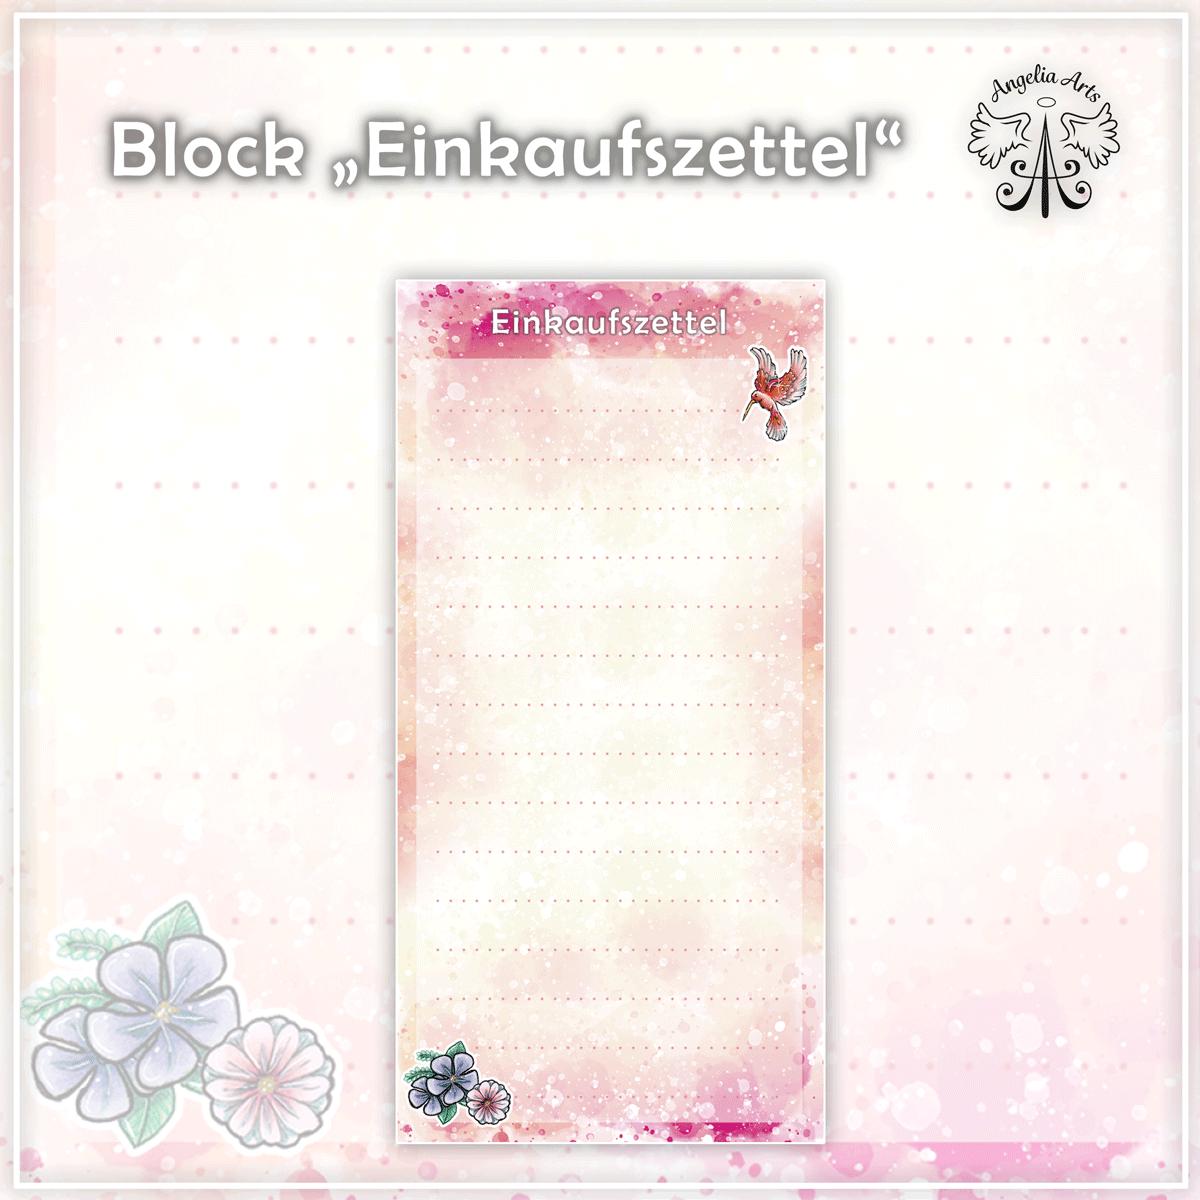 Block-Einkaufszettel